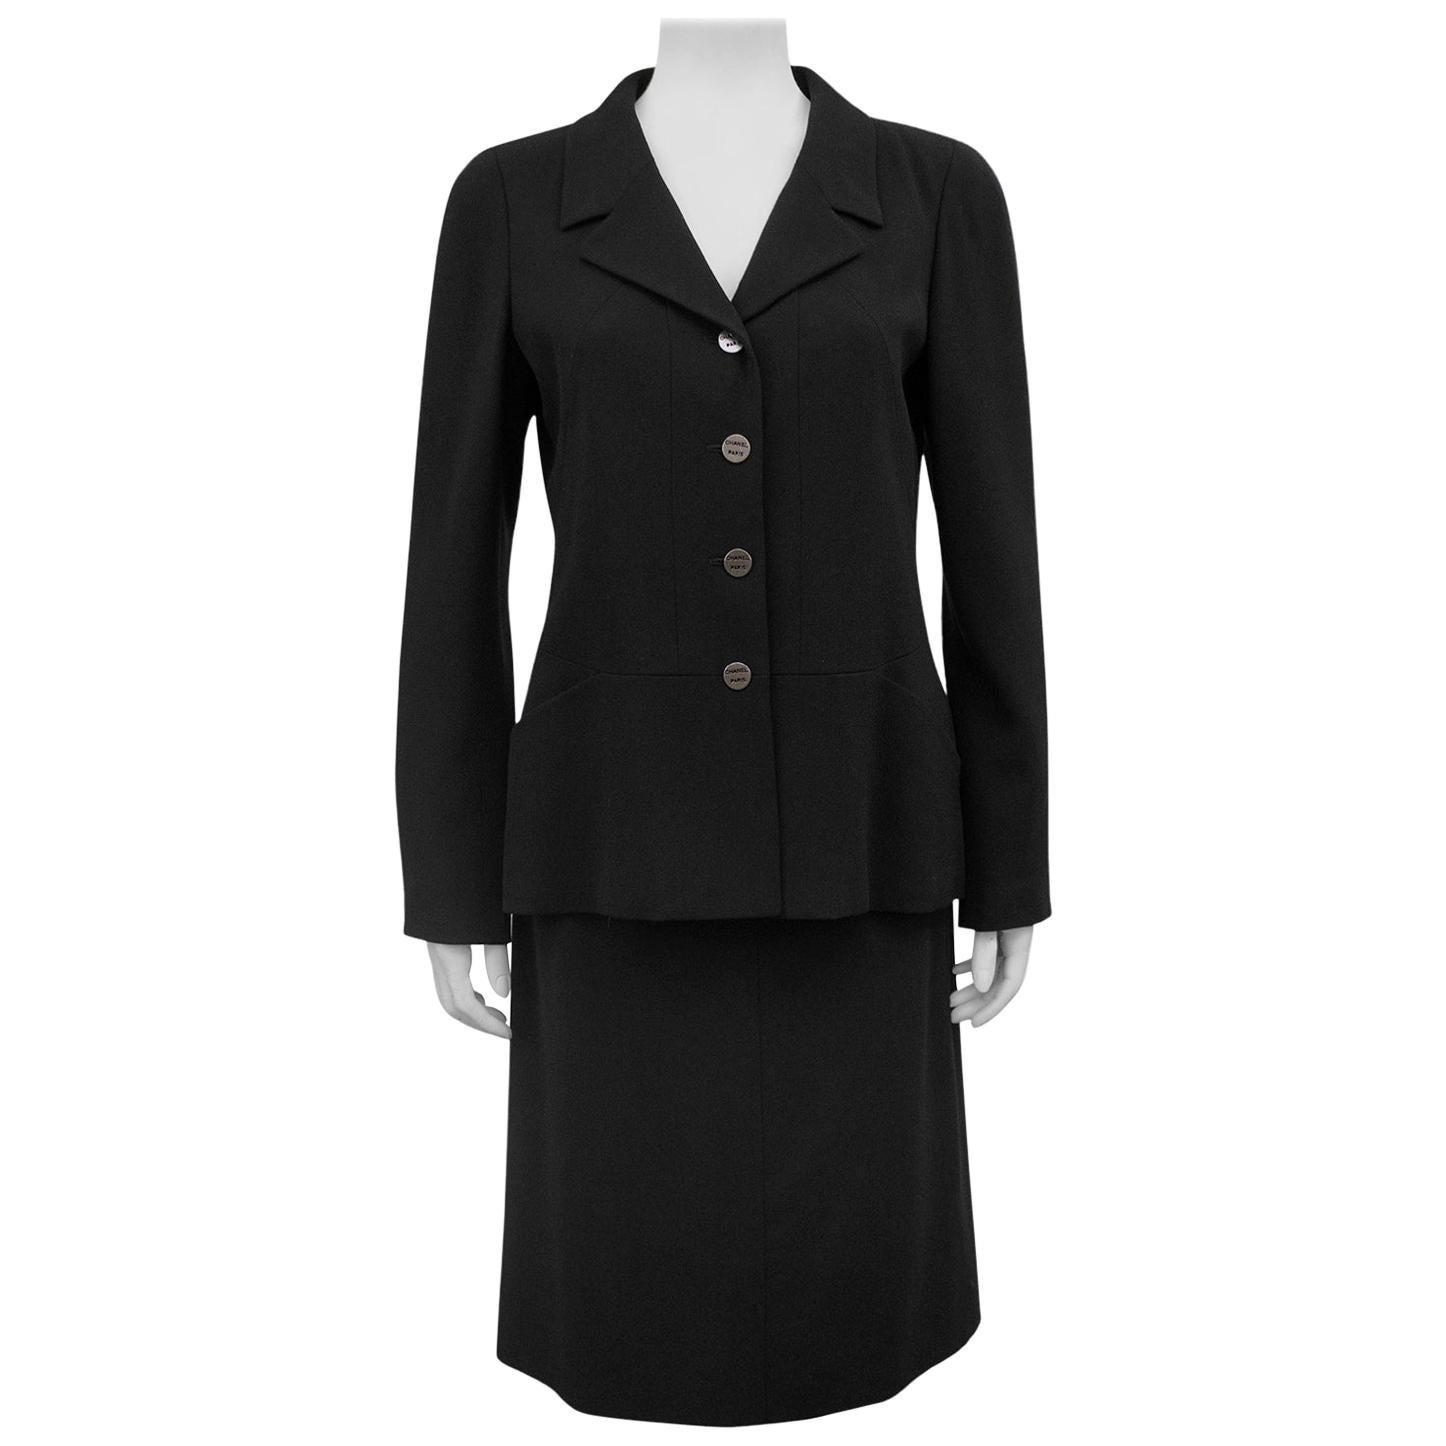 2000 Chanel Black Skirt Suit